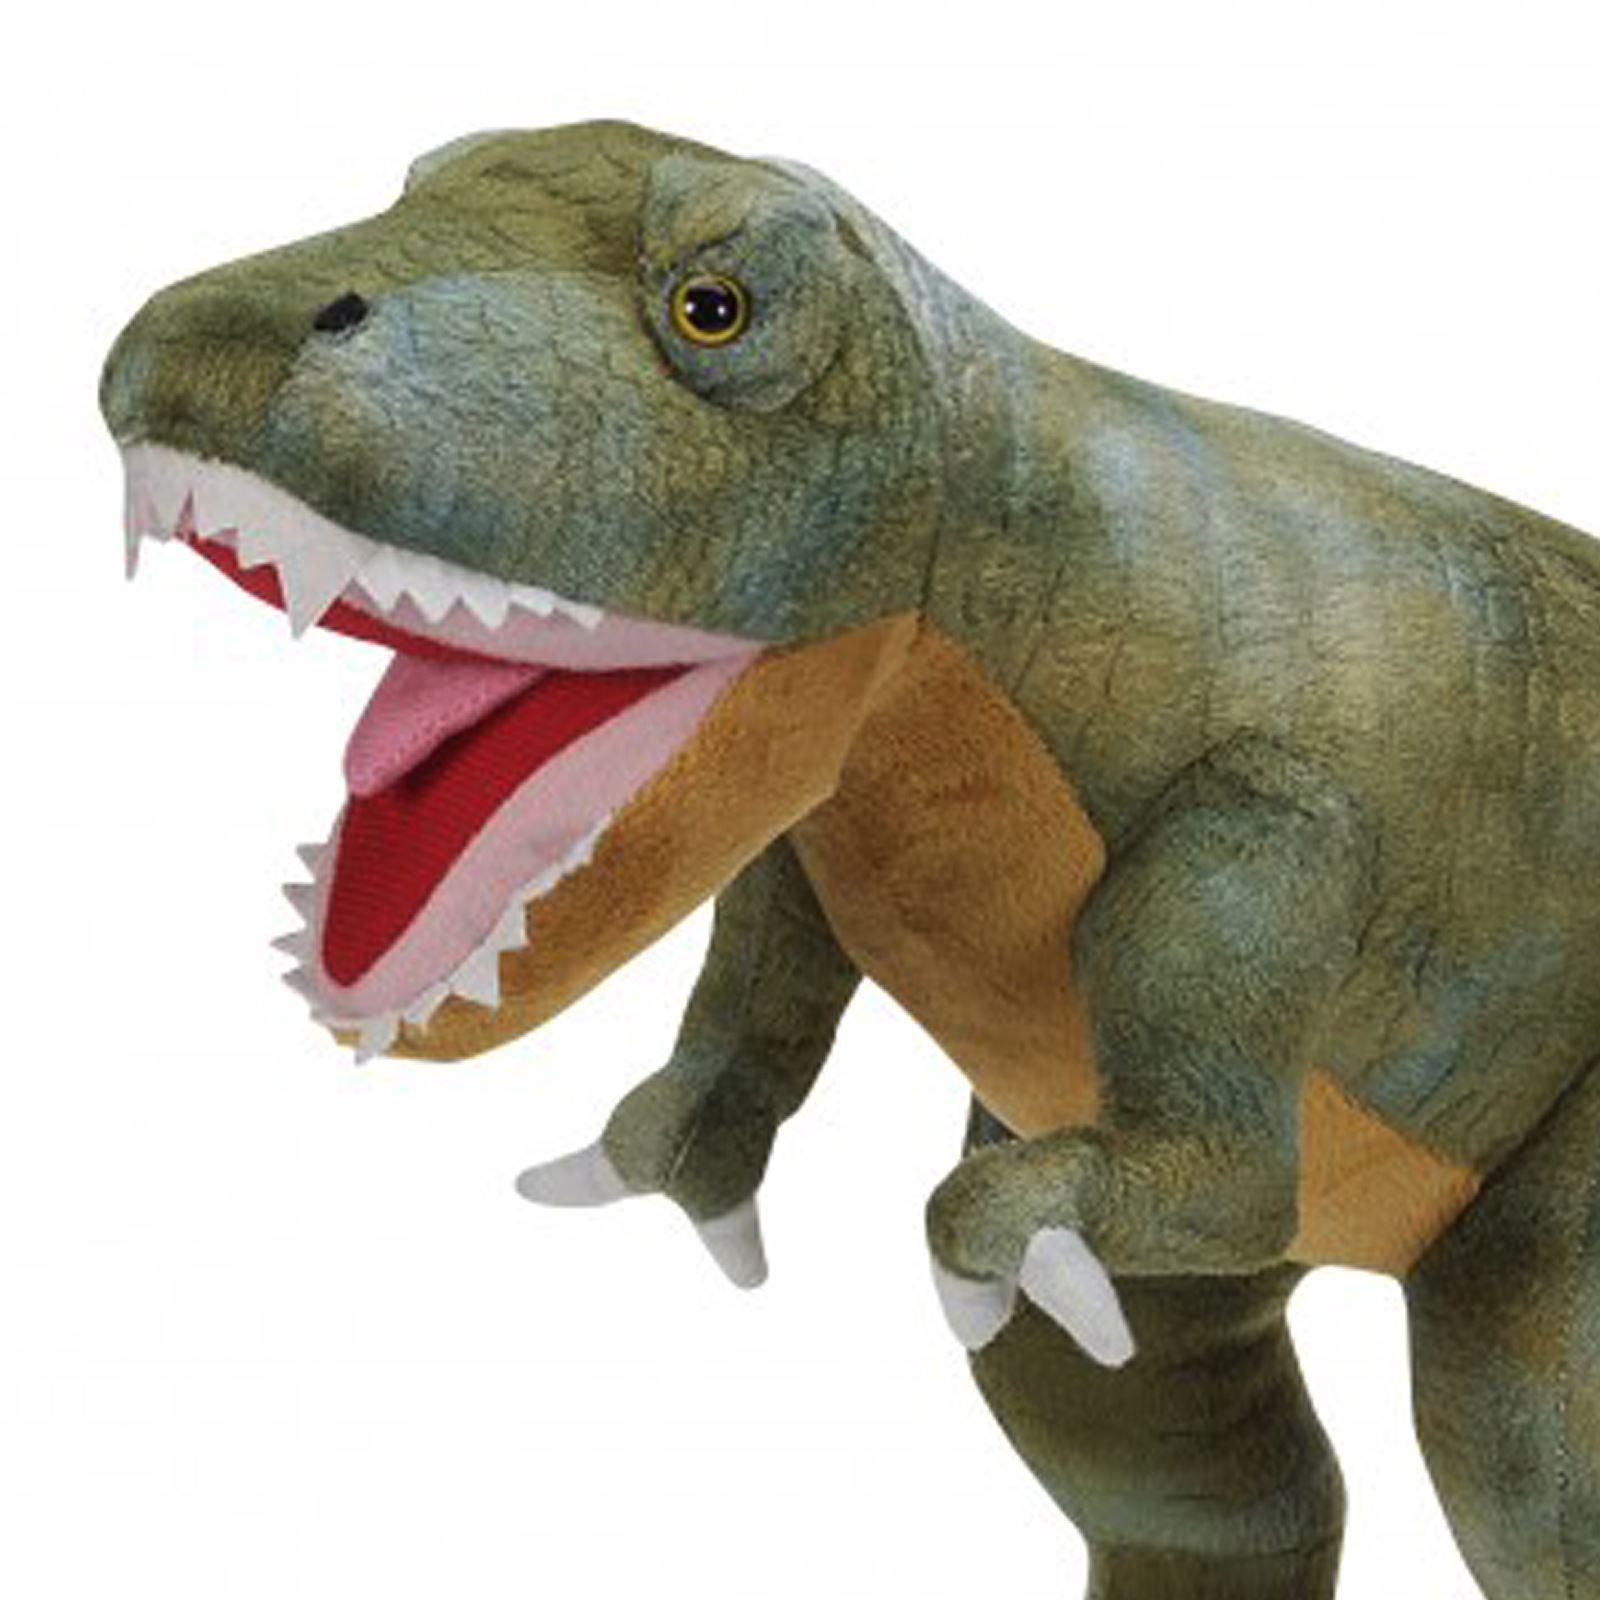 Large Soft Plush Dinosaur Toy Kids Cuddly Stuffed Animal T-Rex Tyrannosaurus Rex  Ebay